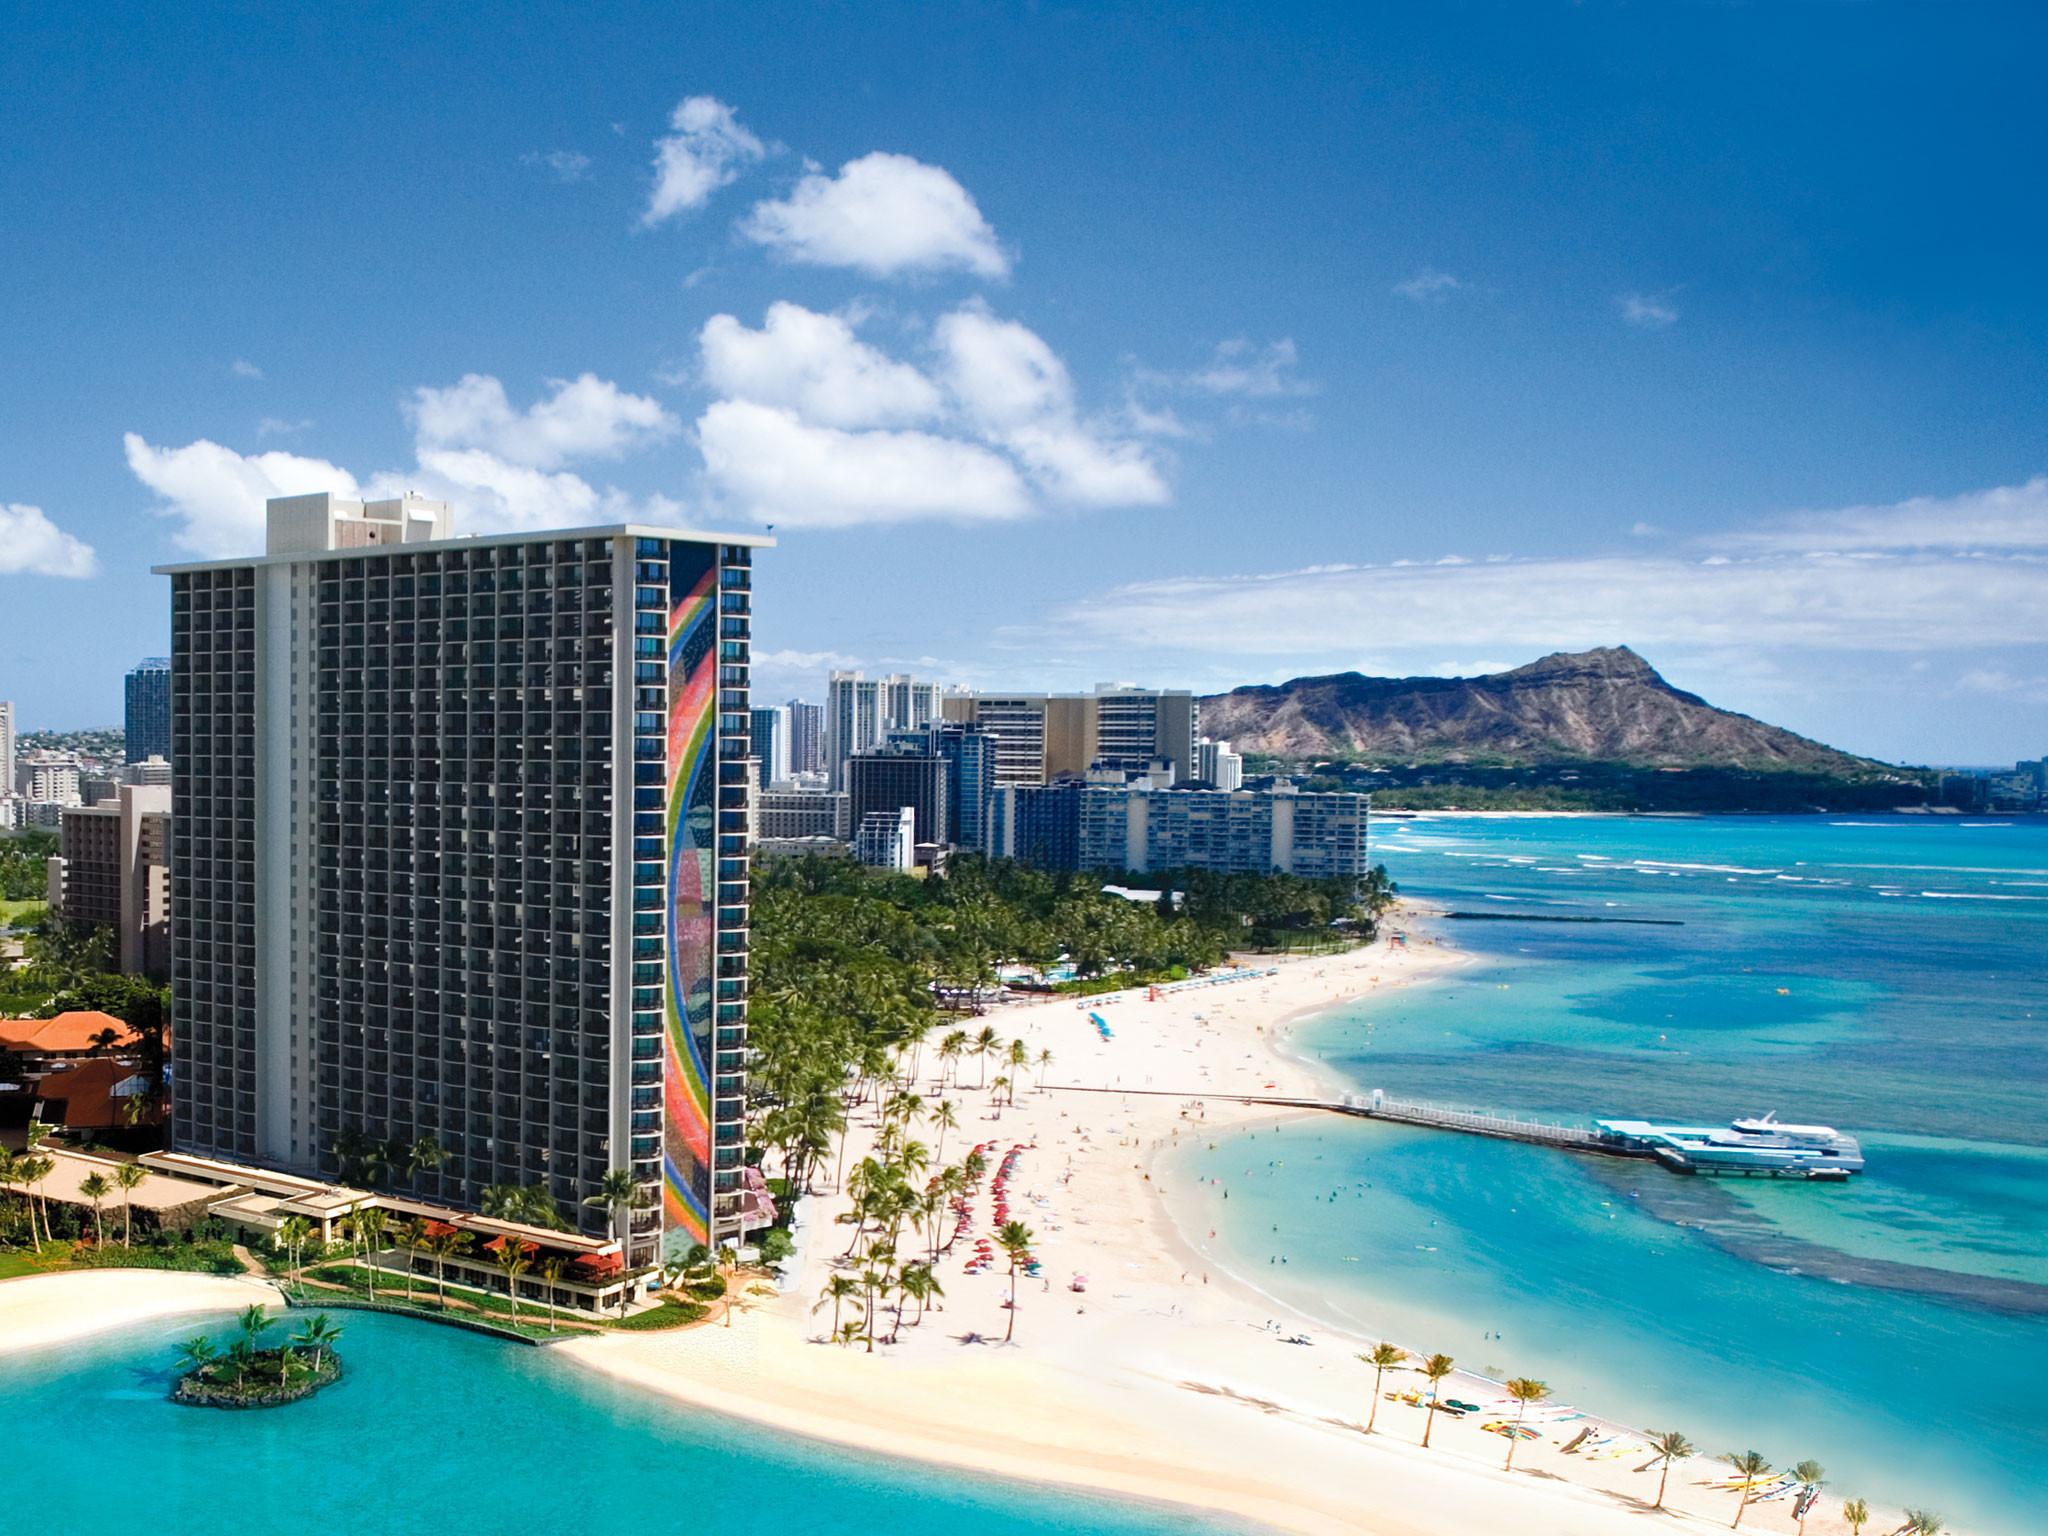 Res: 2048x1536, Waikiki Beach Photos